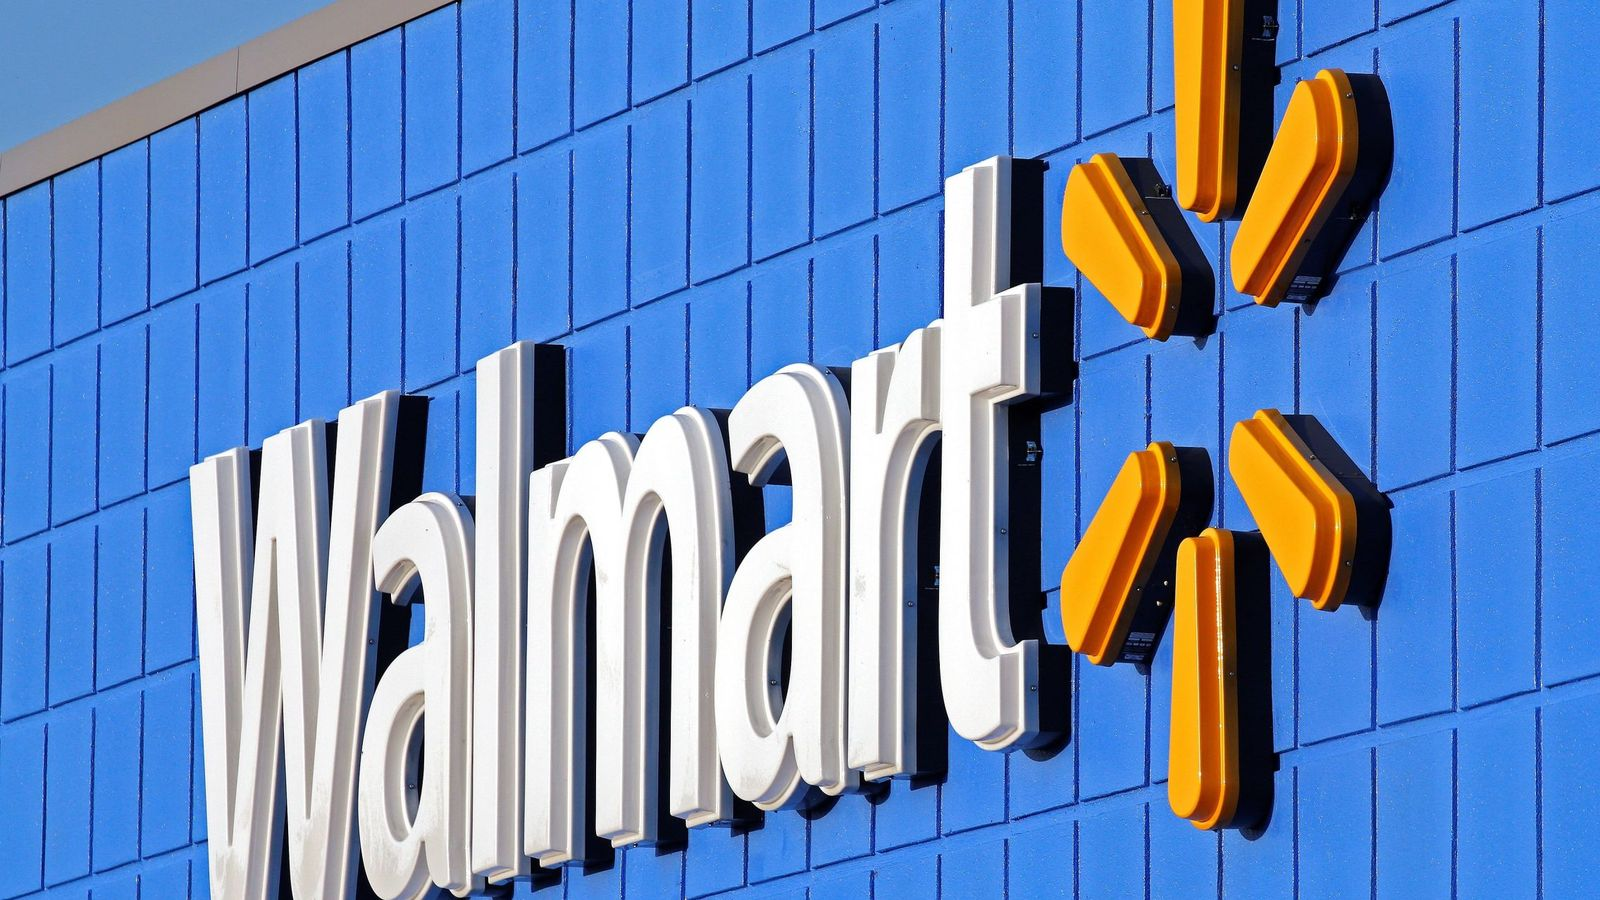 Foto: La decisión de Walmart ha provocado la ira de la NRA (EFE EPA/LARRY W. SMITH)